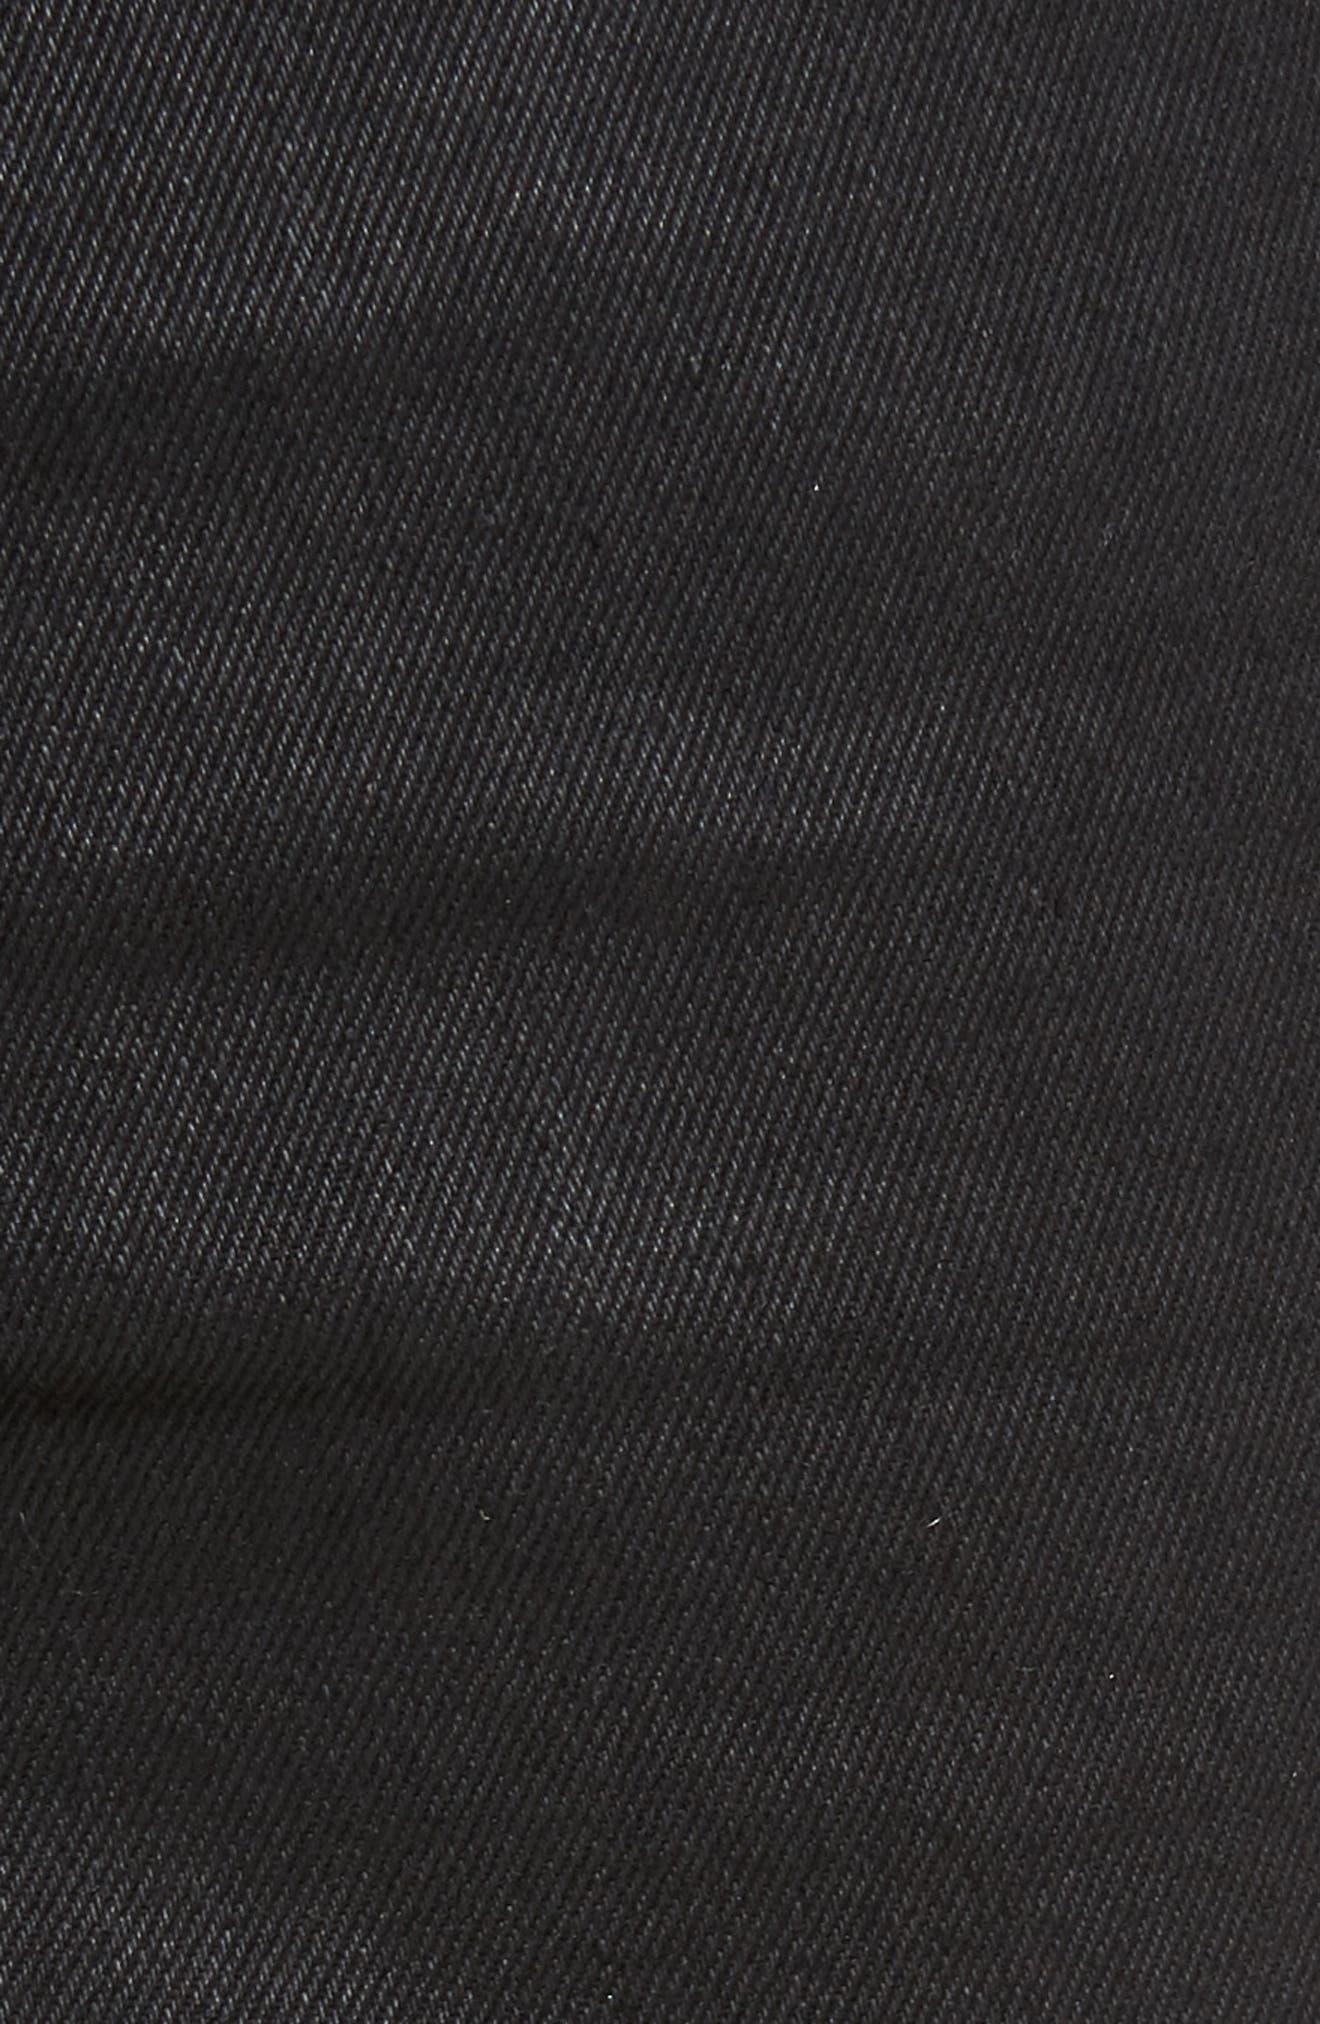 Hunter Skinny Jeans,                             Alternate thumbnail 5, color,                             Vice